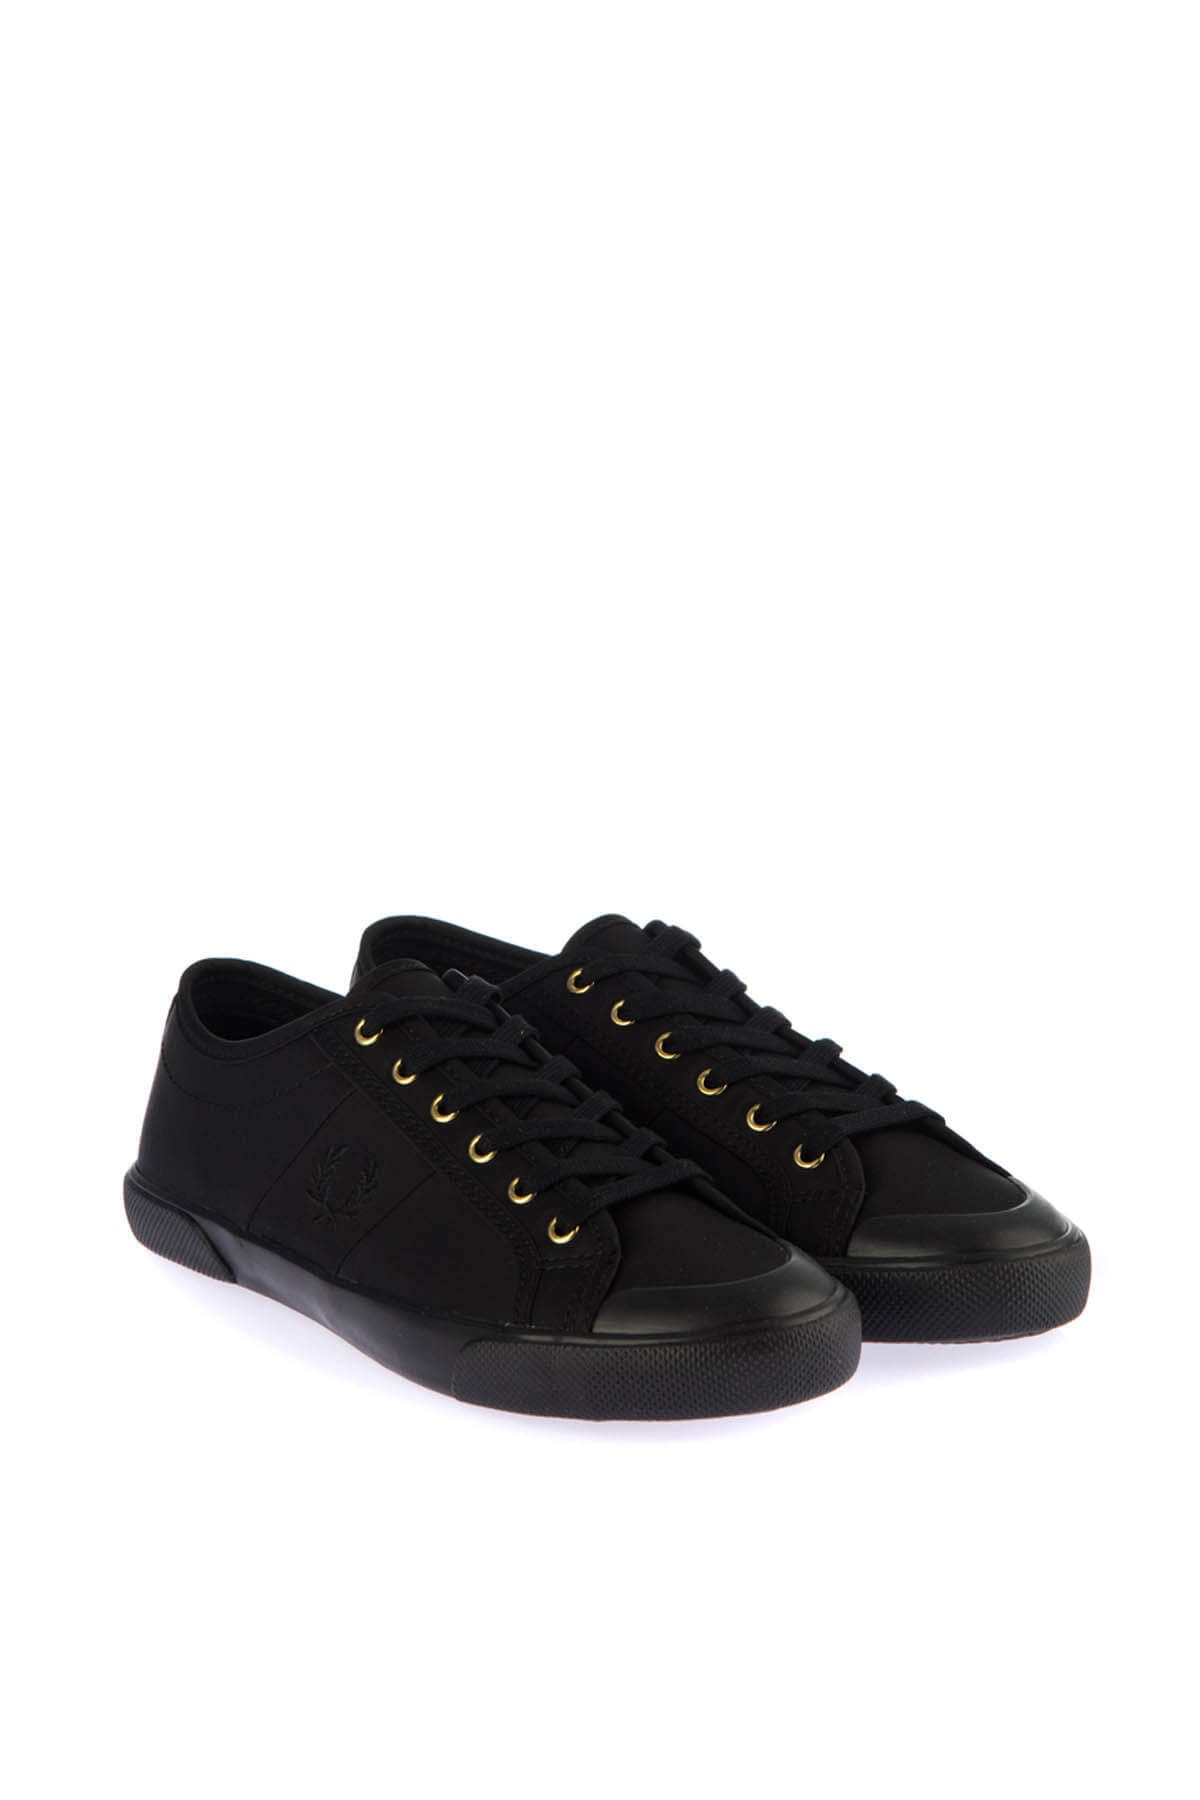 Fred Perry Kadın Siyah Sneaker 183FRPKAYB4307 1